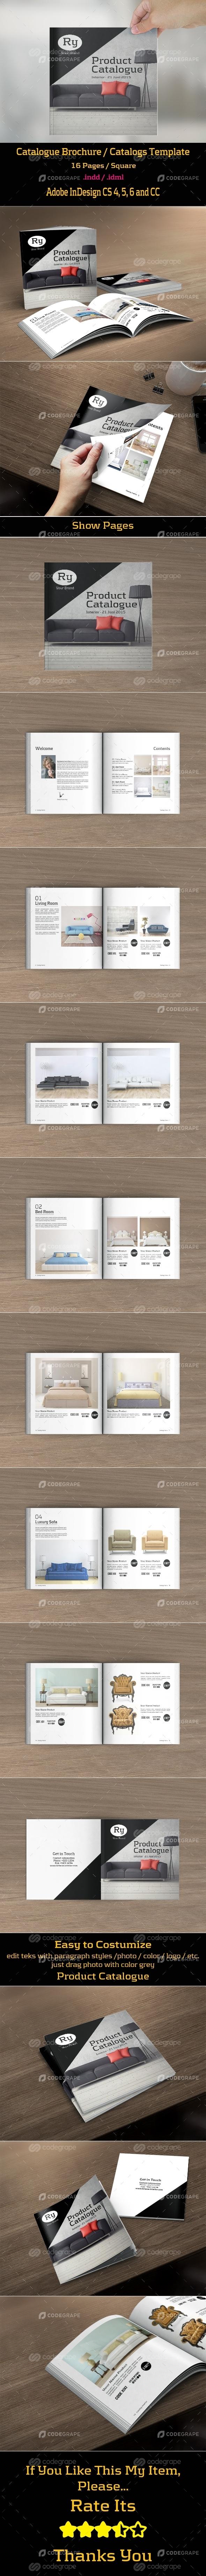 Catalogue Interior Square